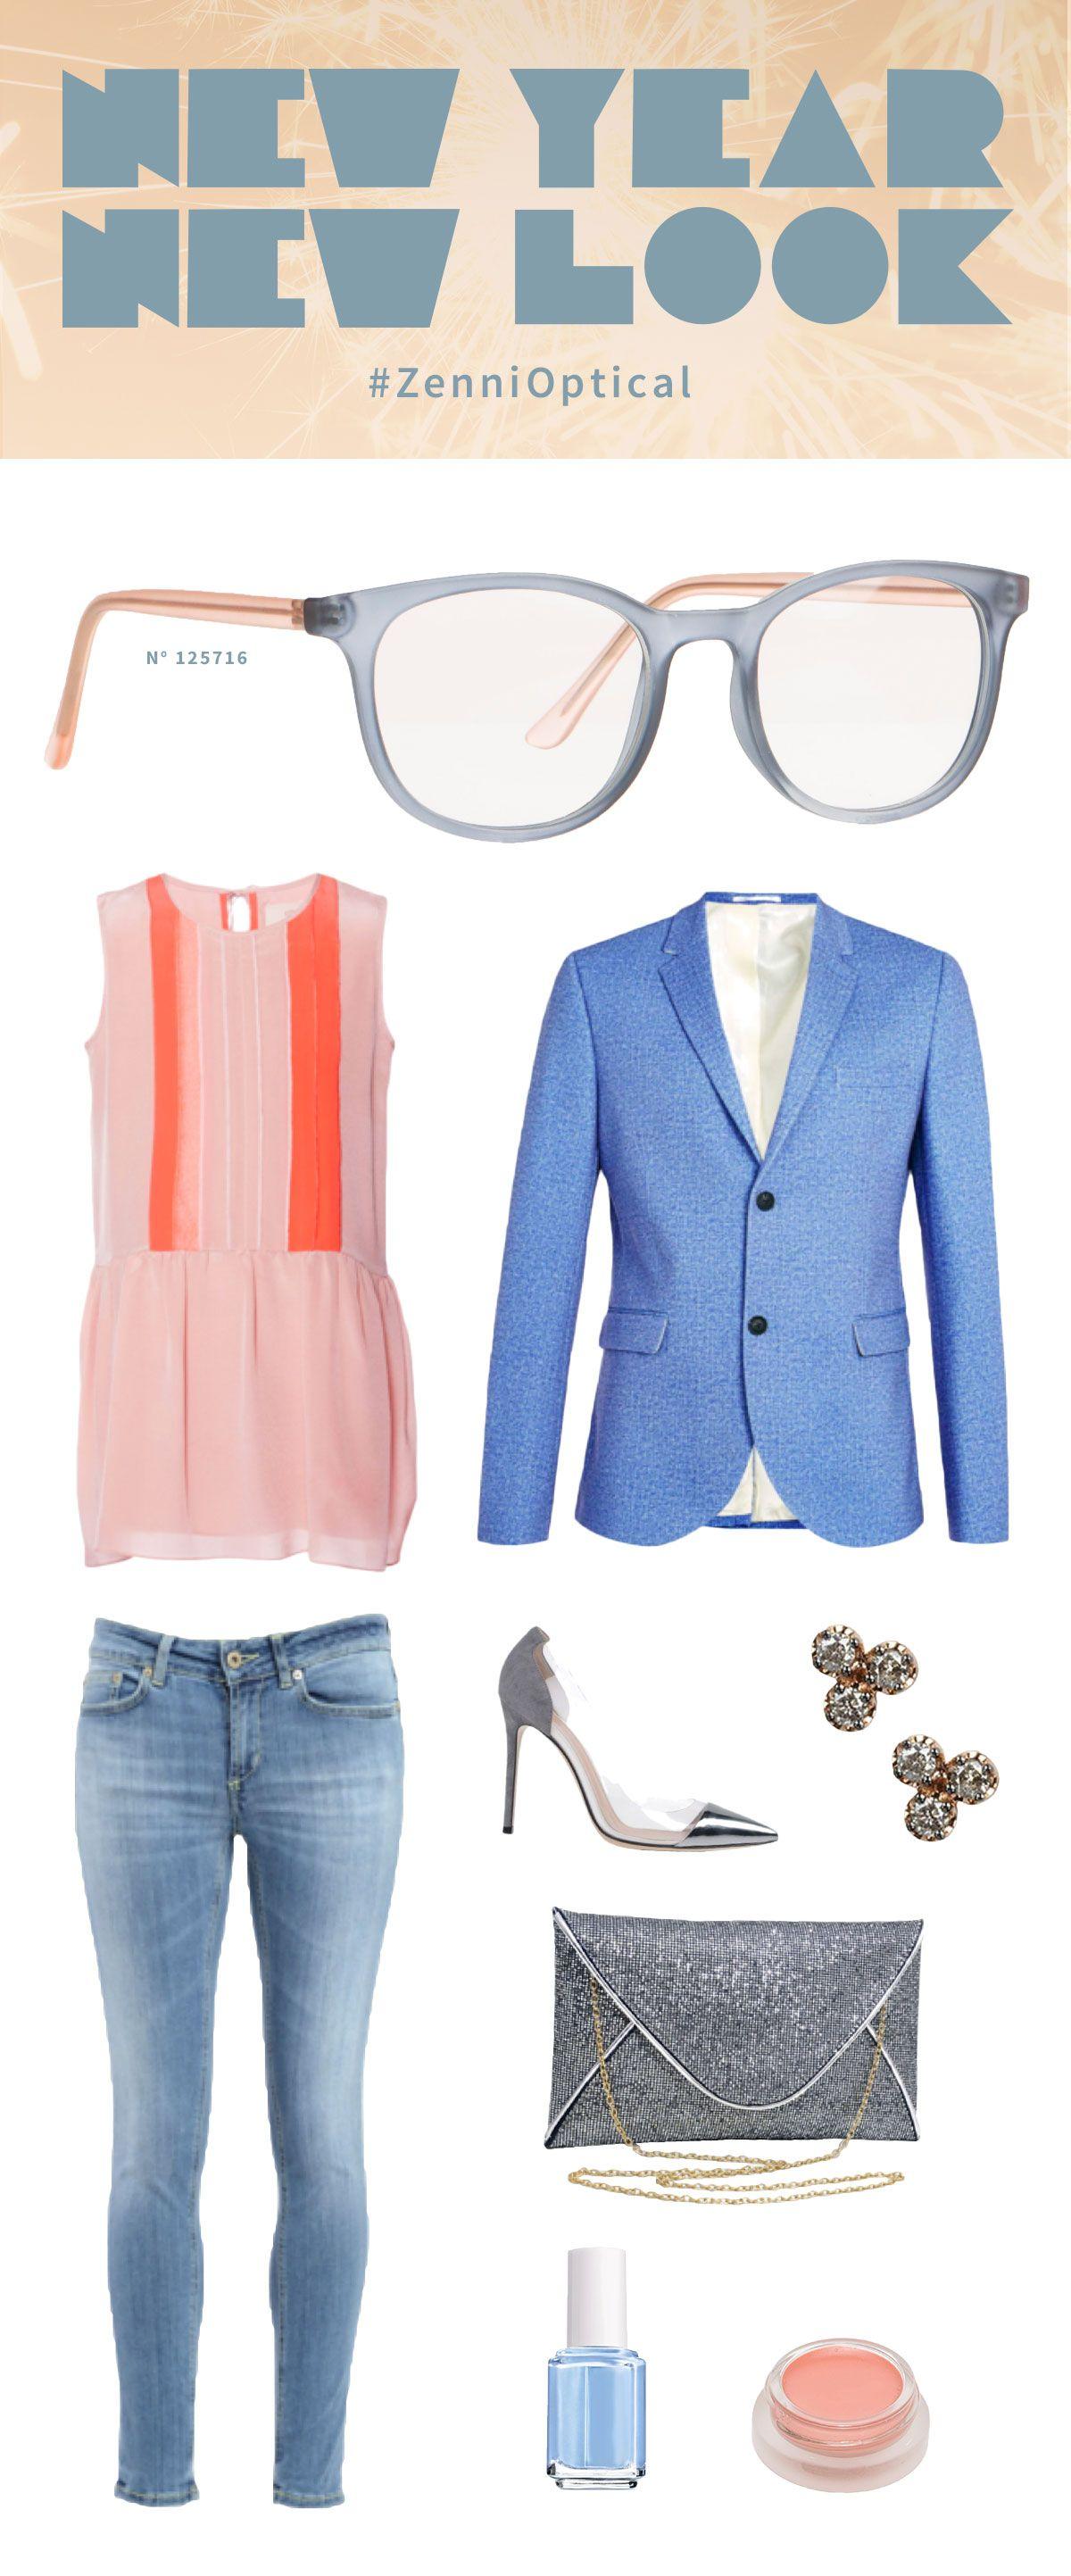 7df48d2c5b Enter the  ZenniOptical New Year New Look Pinterest contest! Just choose  your favorite Zenni